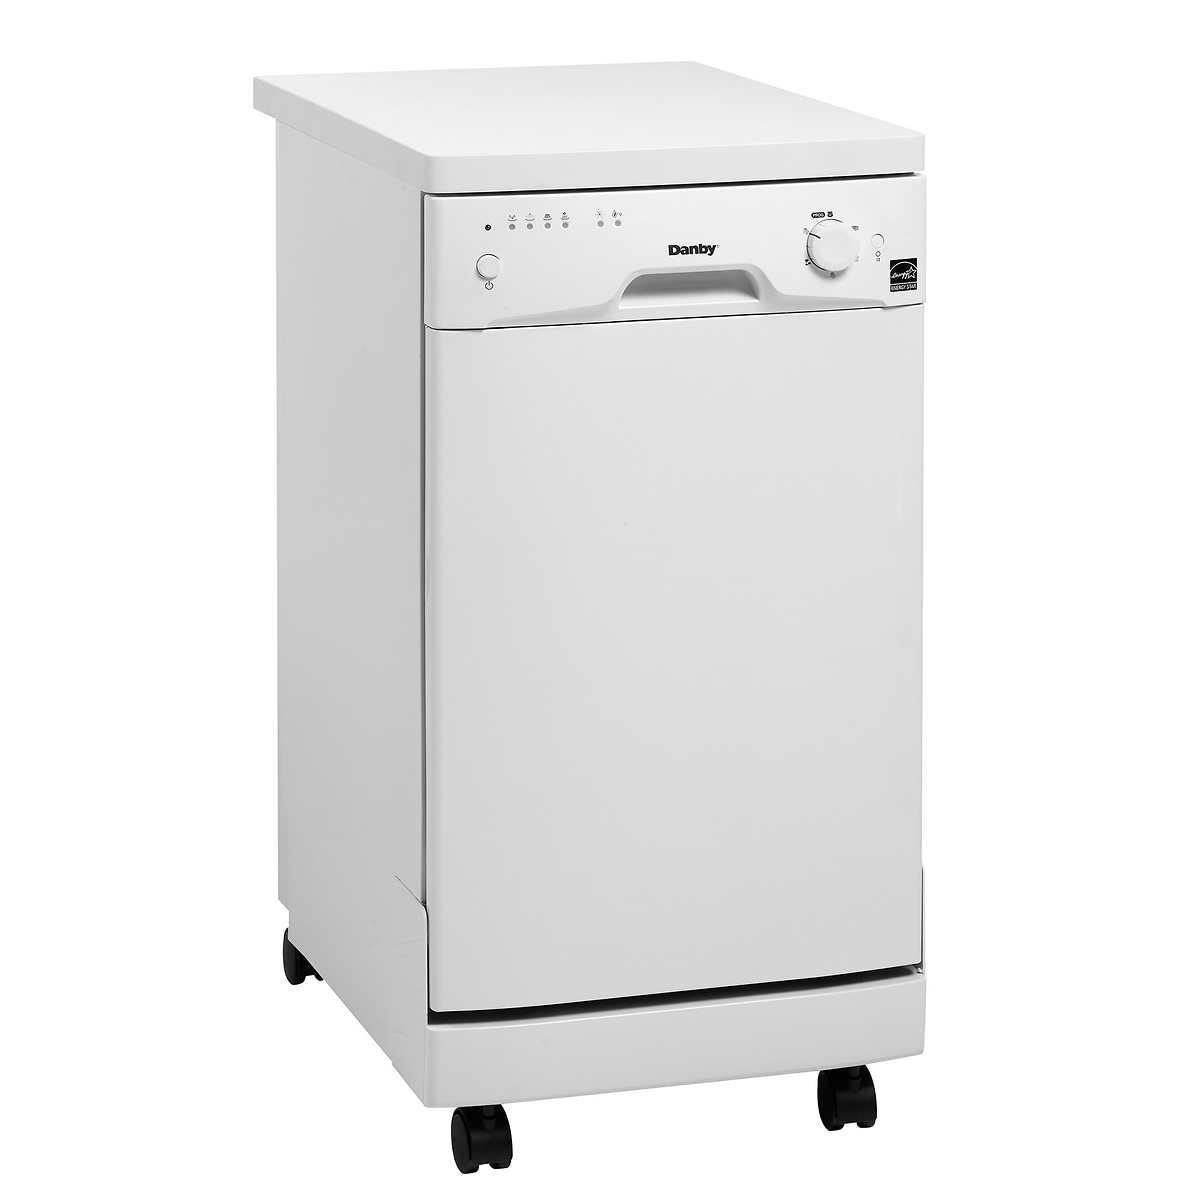 Portable Dishwasher 1